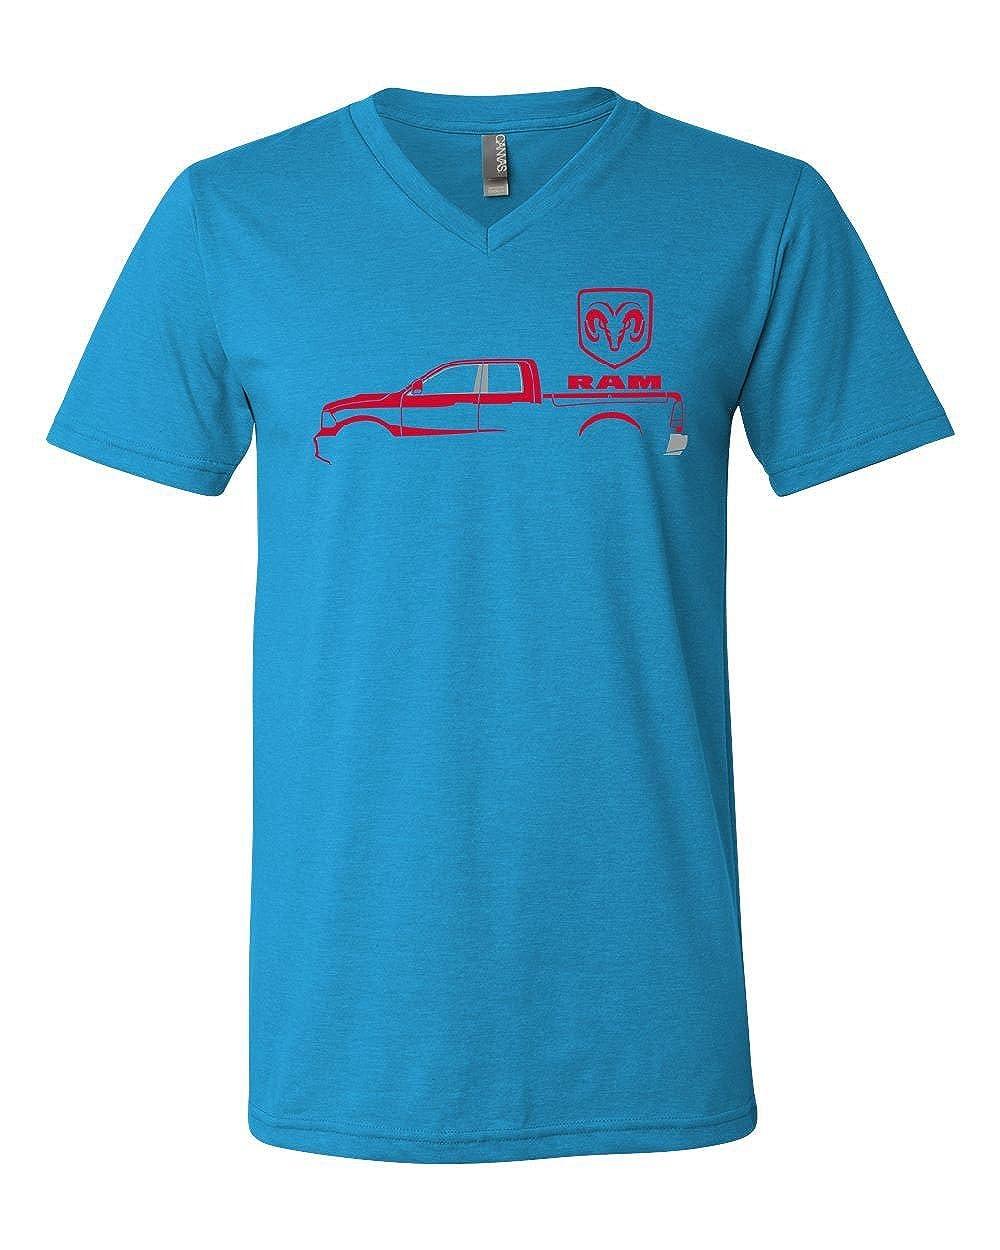 Dodge RAM Red Truck V-Neck T-Shirt Heavy Duty Pickup Truck Tee